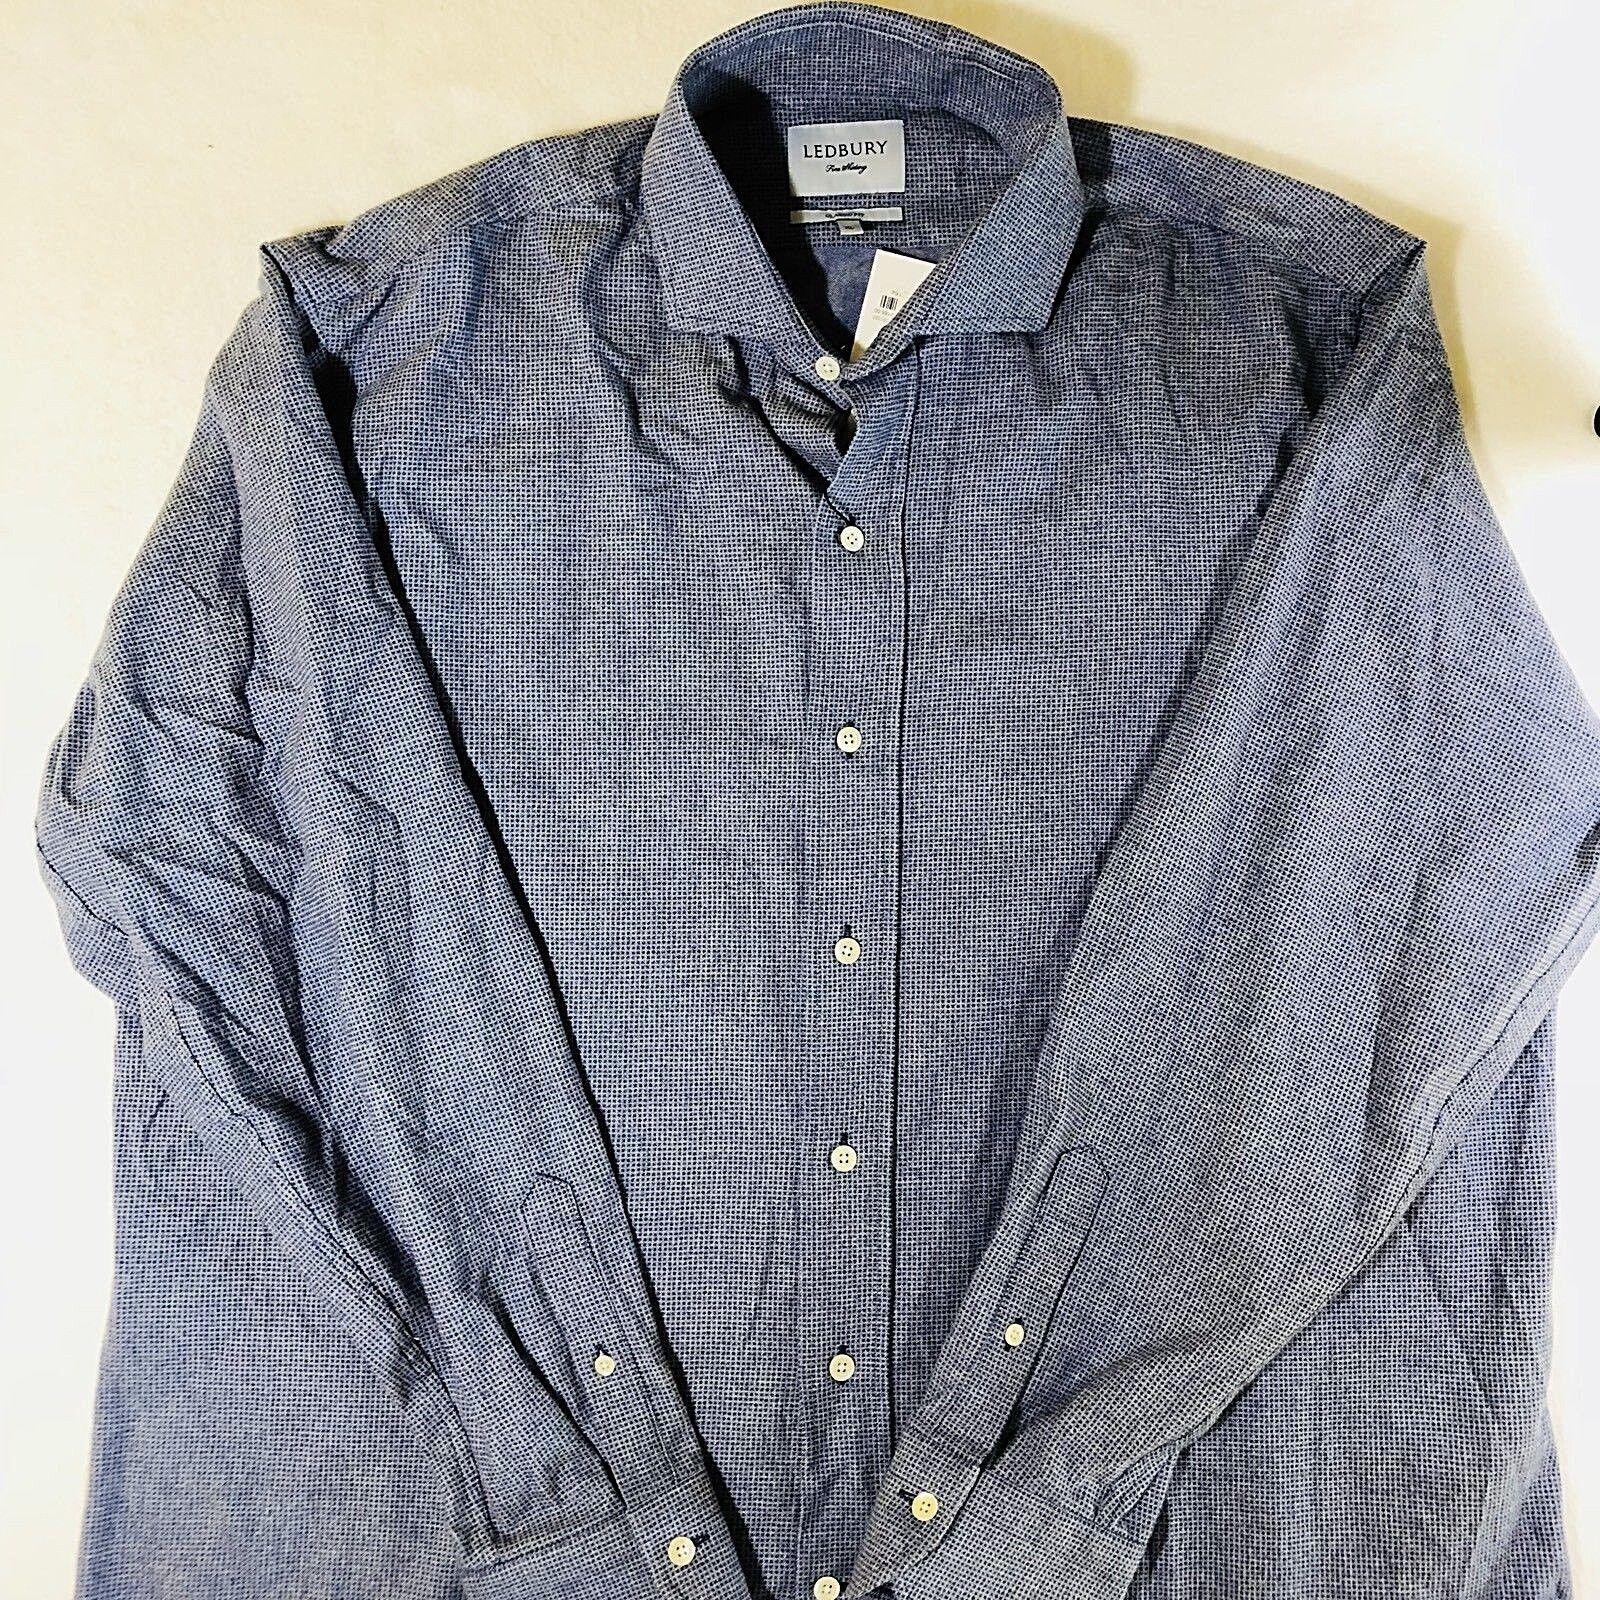 Ledbury Harrisburg Print Men's Button Down 100% Cotton Long Sleeve Shirt Sz XL